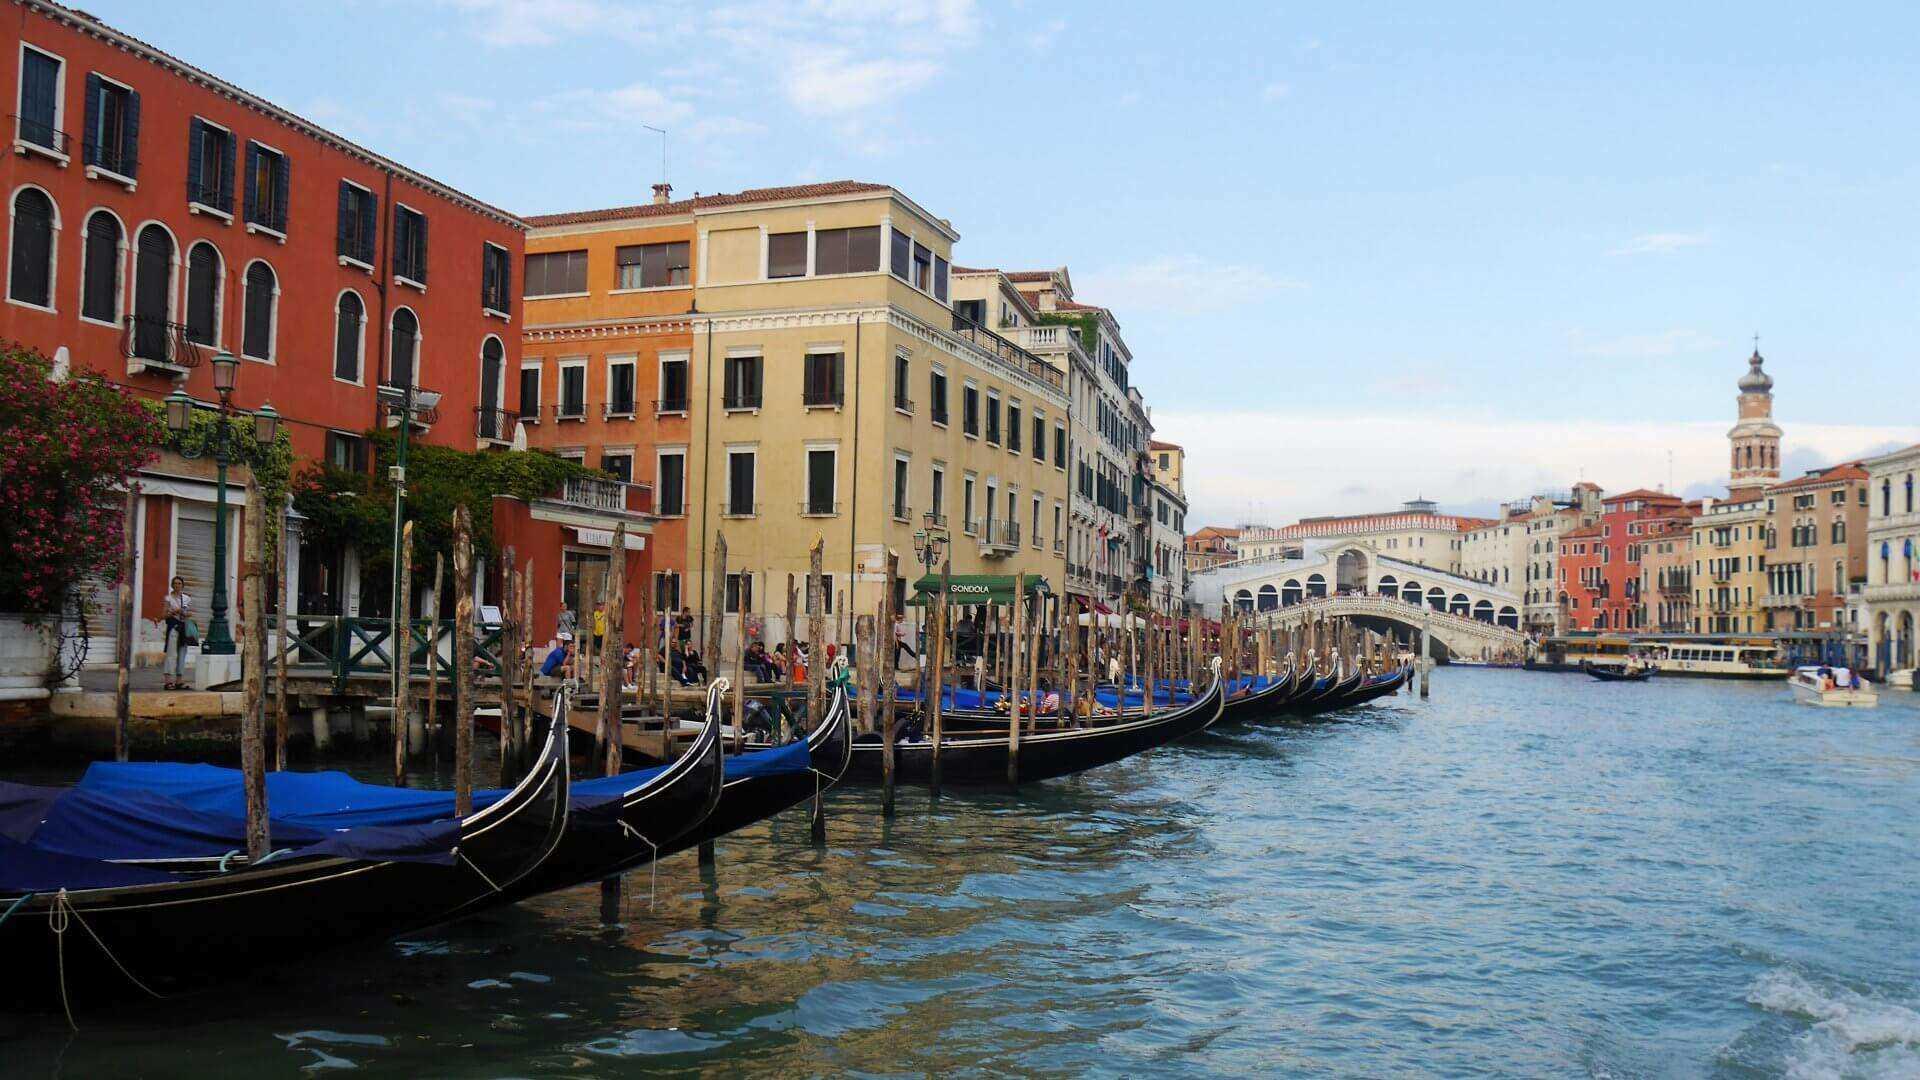 Direktflüge nach Venedig